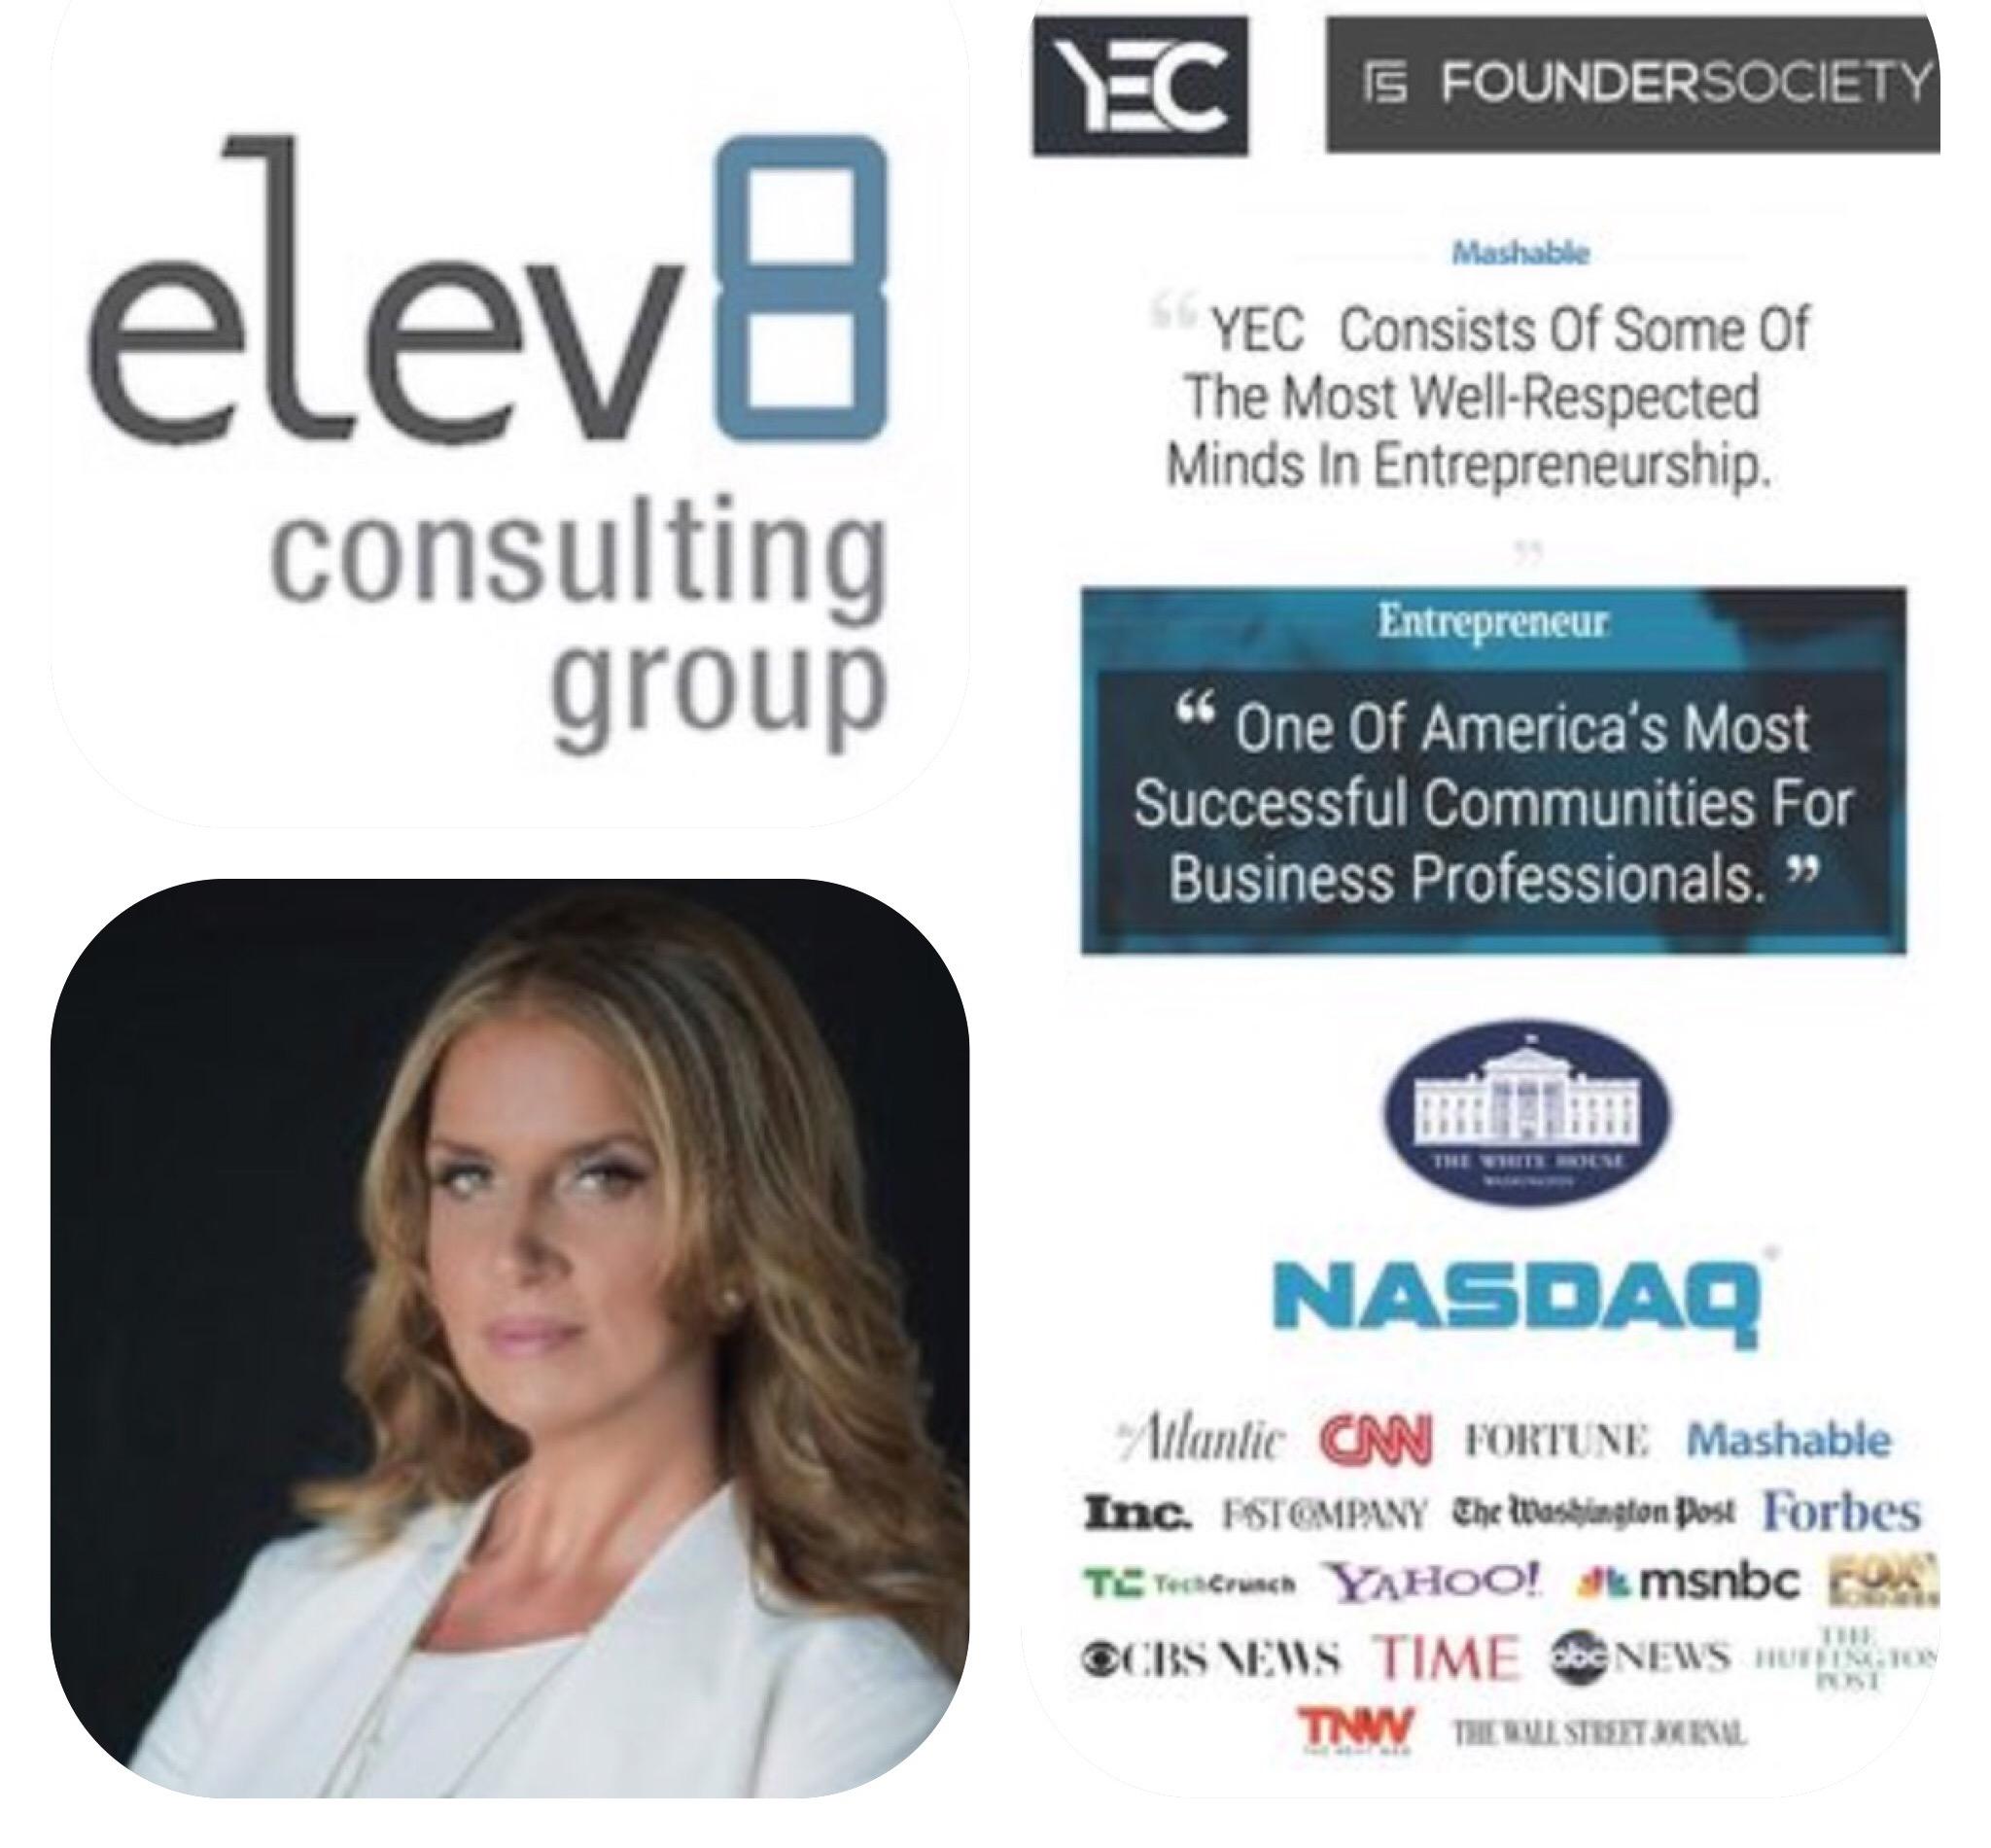 Entrepreneurial Tips By YEC Founder Society Members Featuring Elev8 CEO Angela Delmedico